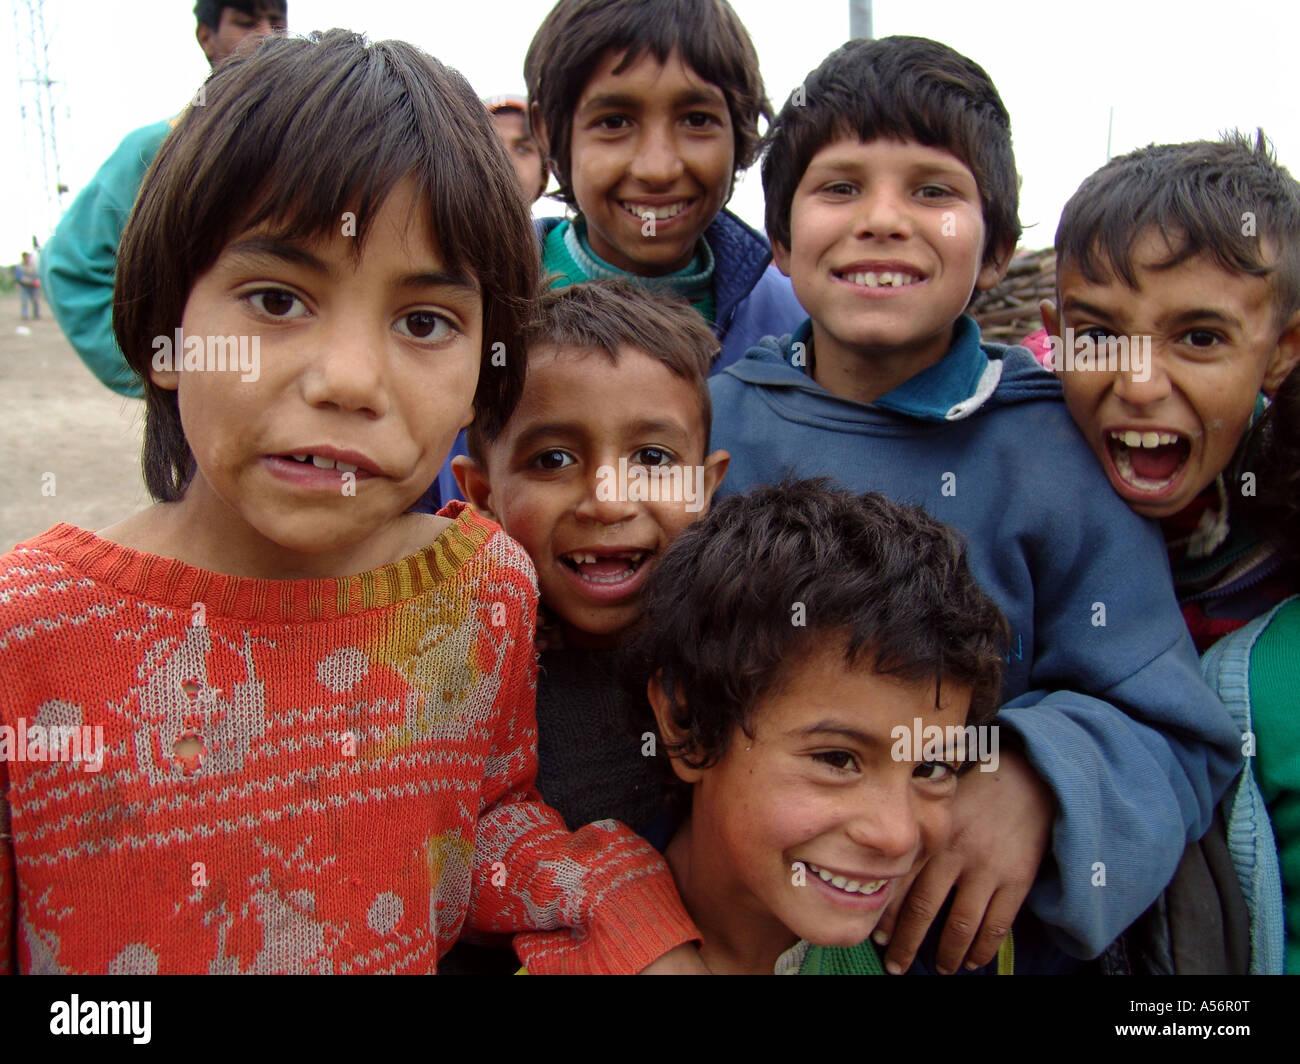 gipsy child Painet ja0741 children kids bulgaria romas karlova photo 2004 europe child  kid gypsy gipsy country developing